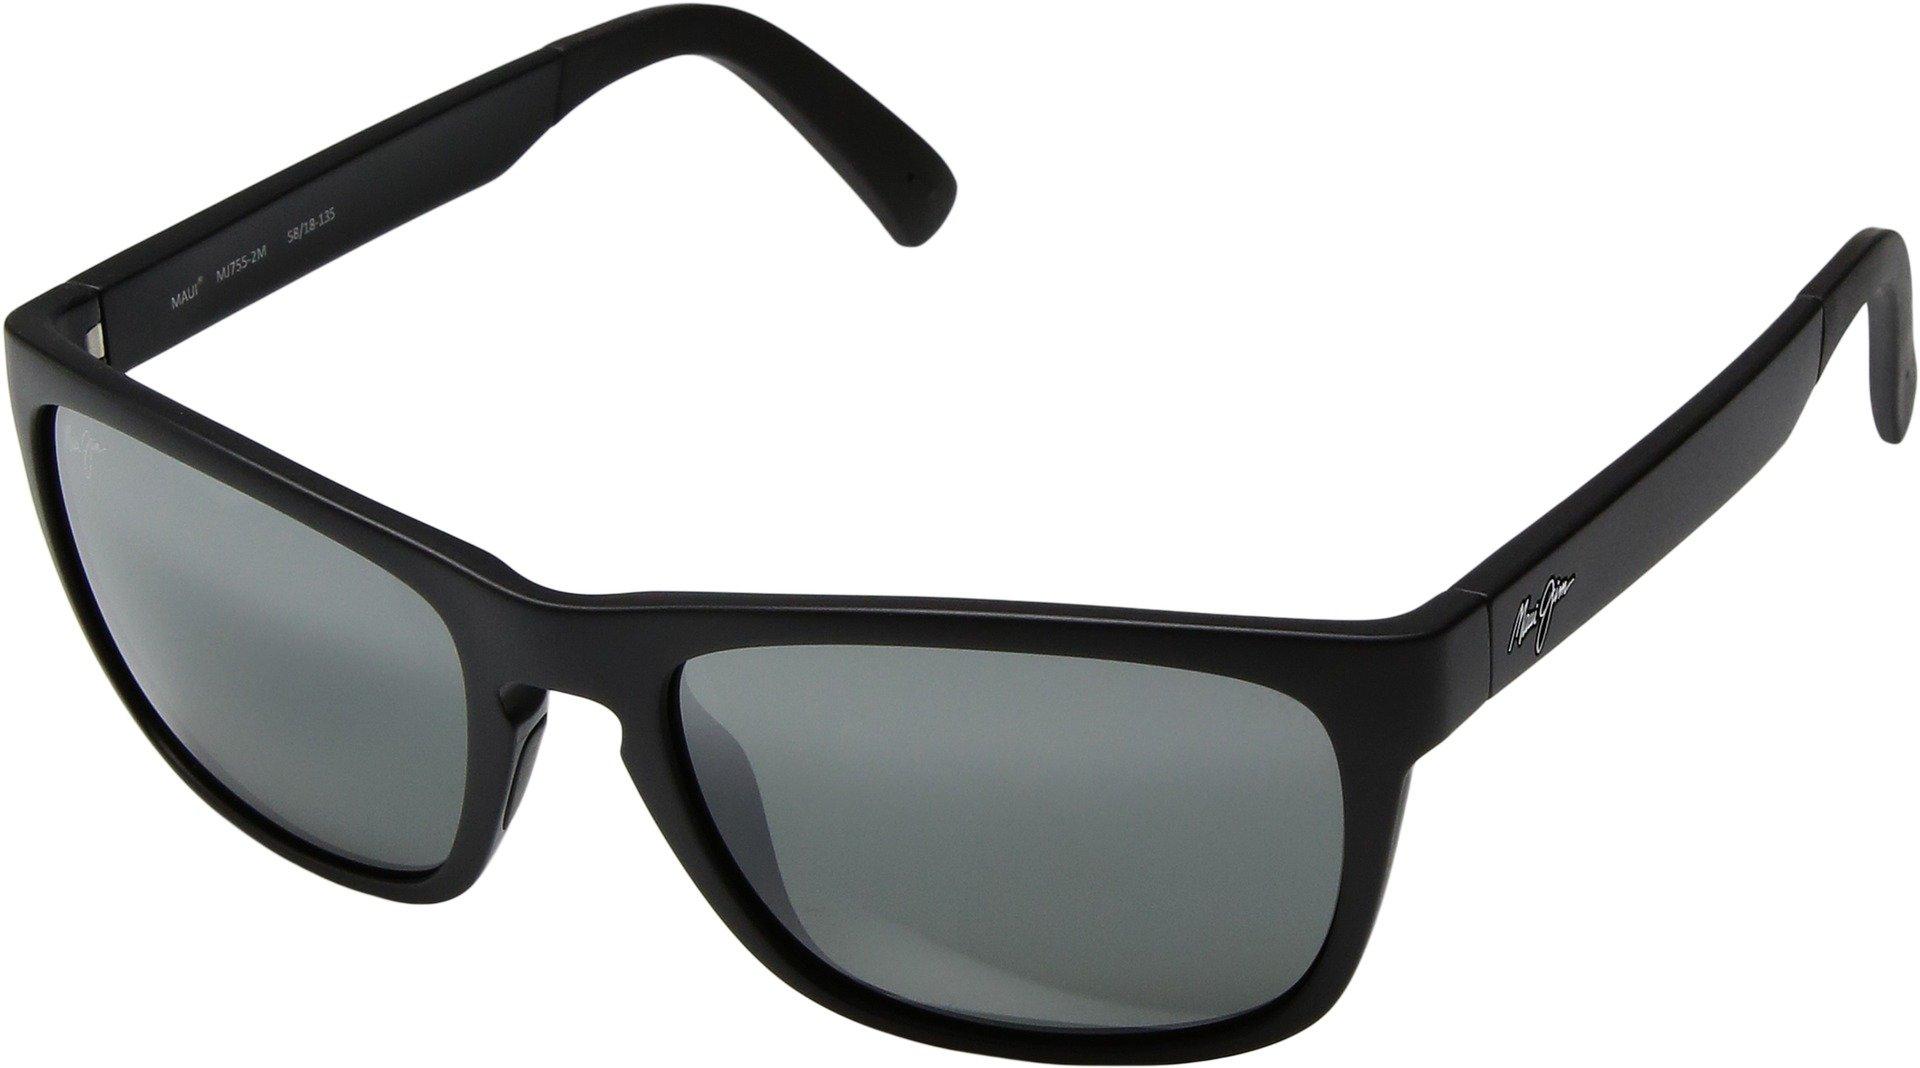 Maui Jim Unisex South Swell Matte Black/Neutral Grey Sunglasses